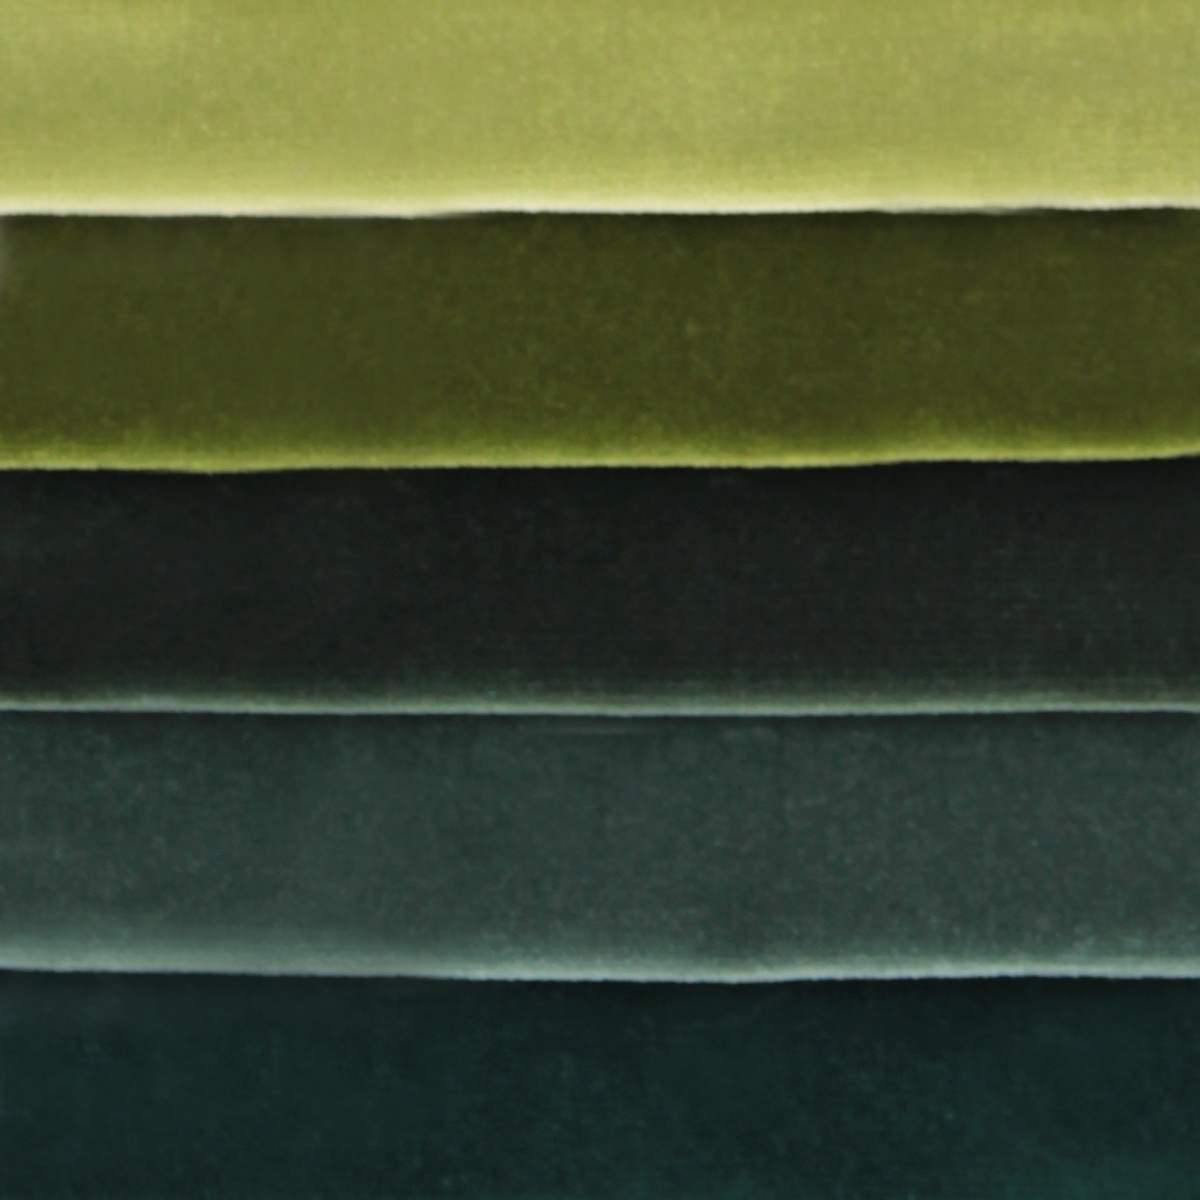 Moscou velvet Fabric